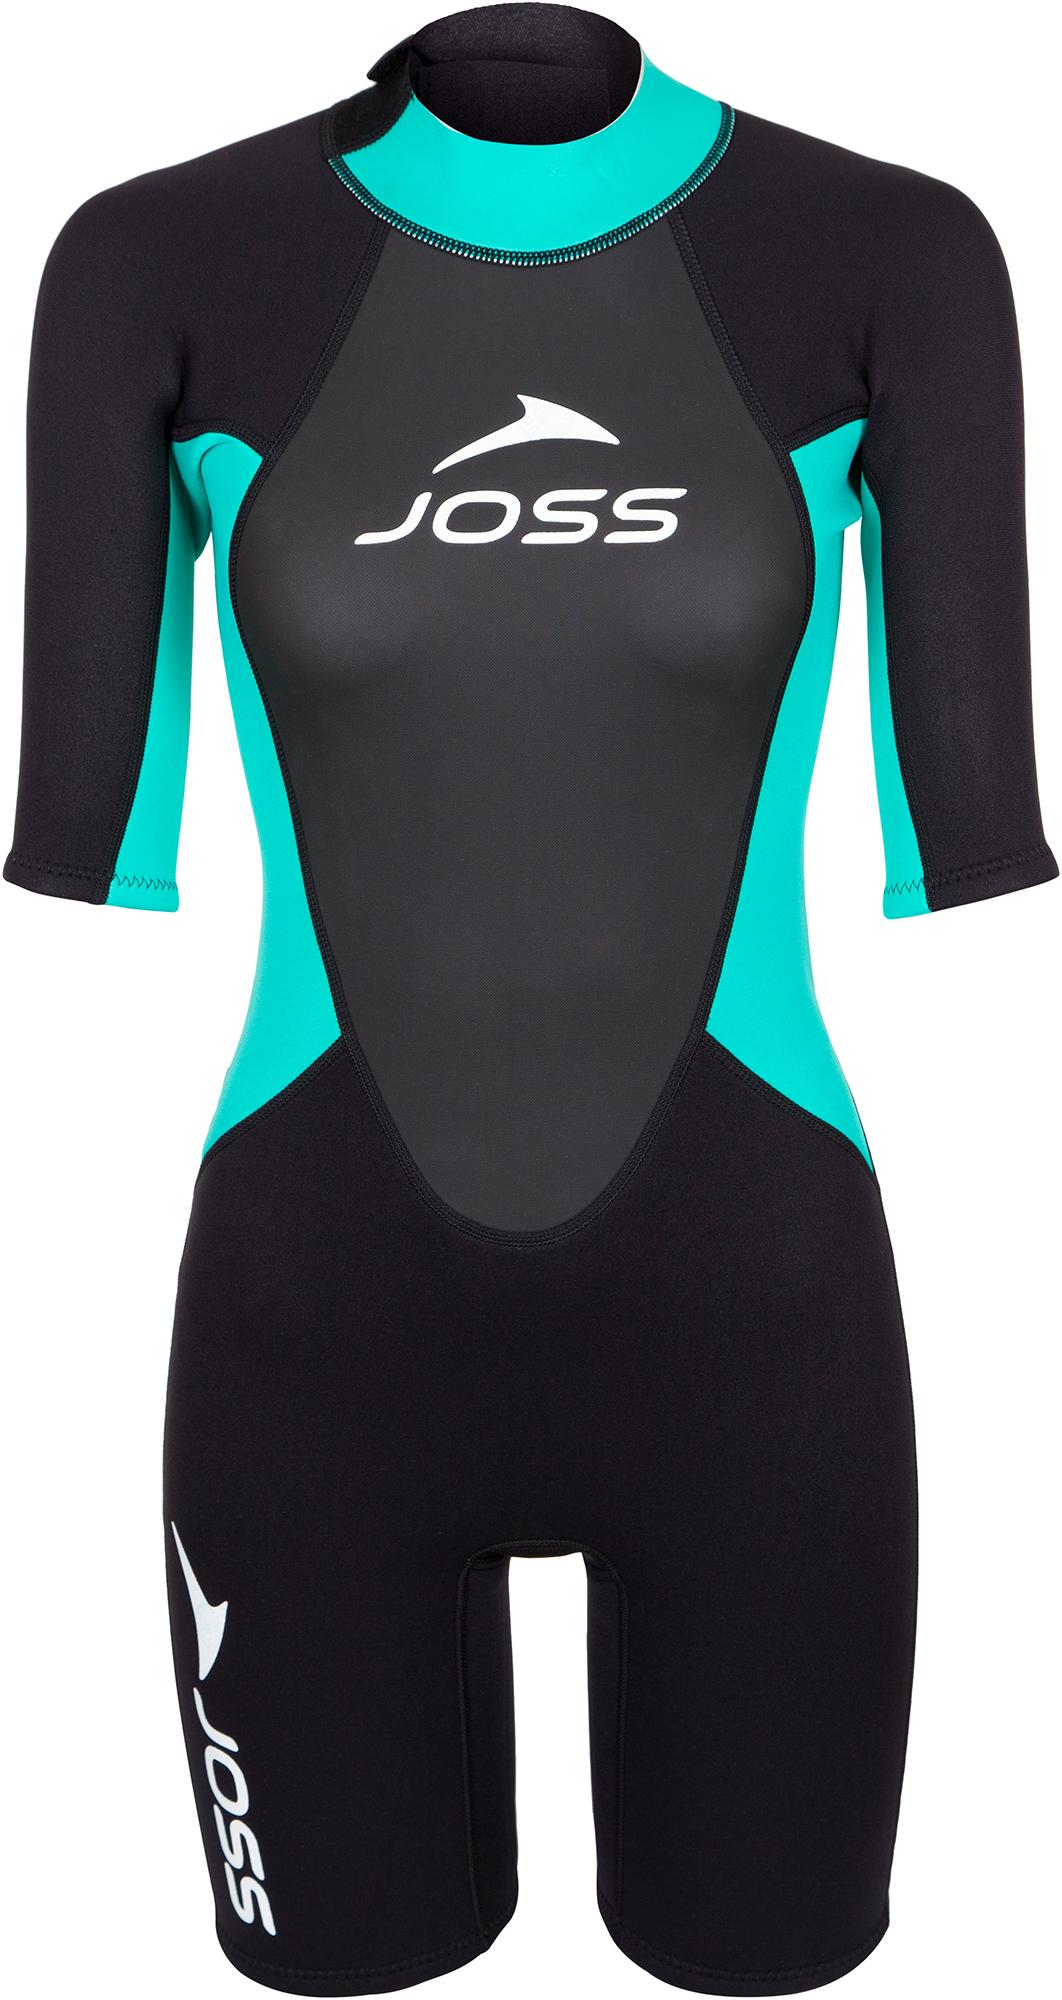 Joss Гидрокостюм короткий женский 2,5, размер 46